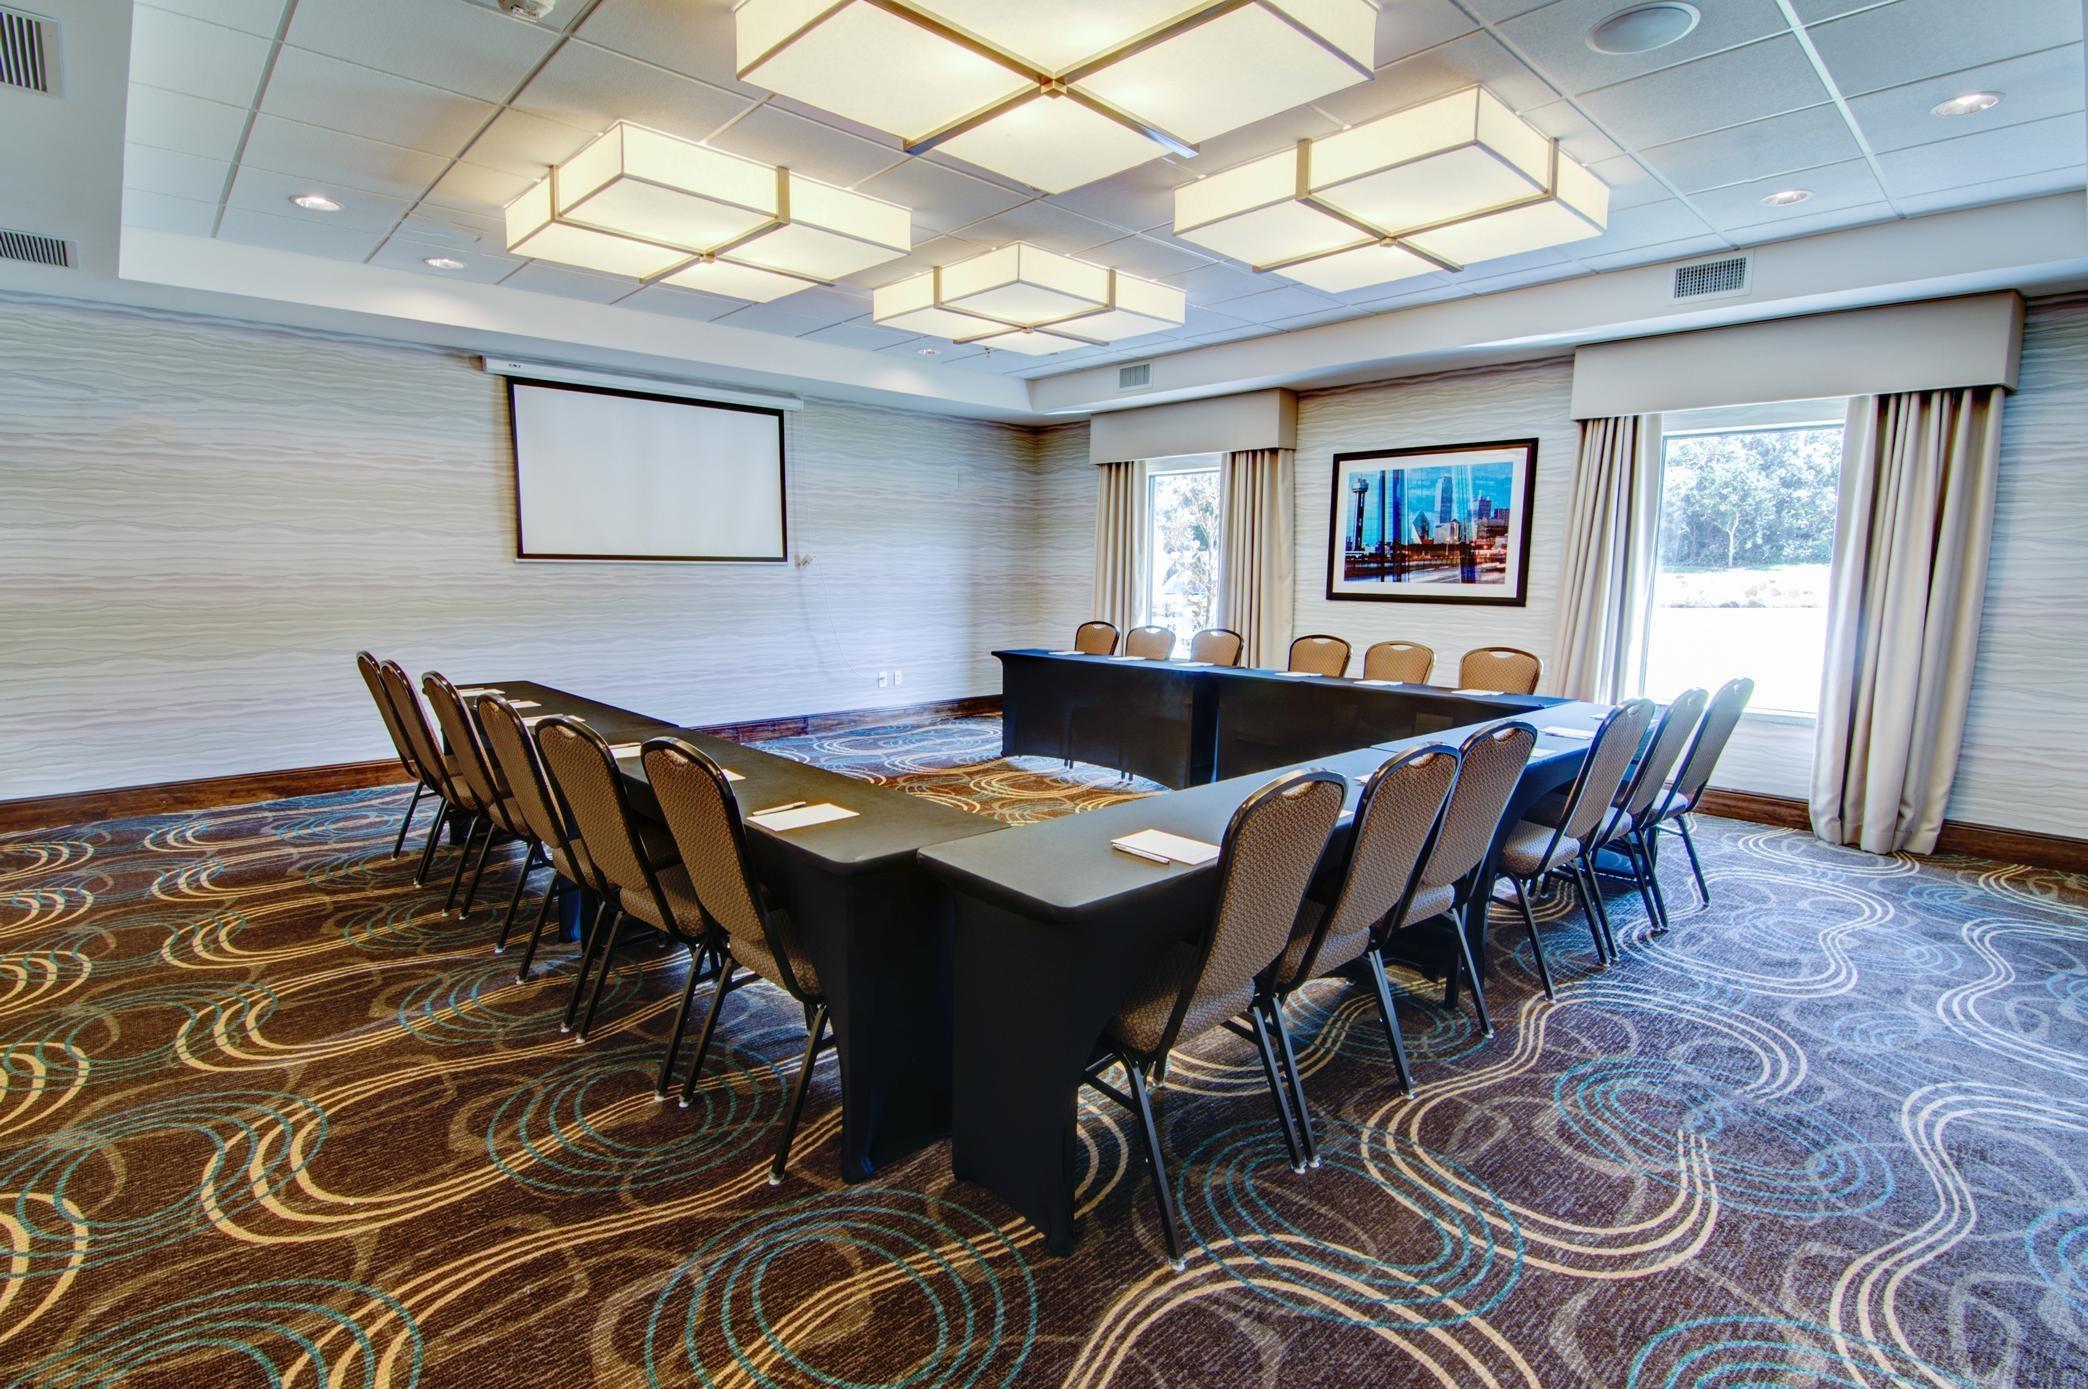 Hampton Inn & Suites Trophy Club - Fort Worth North image 13